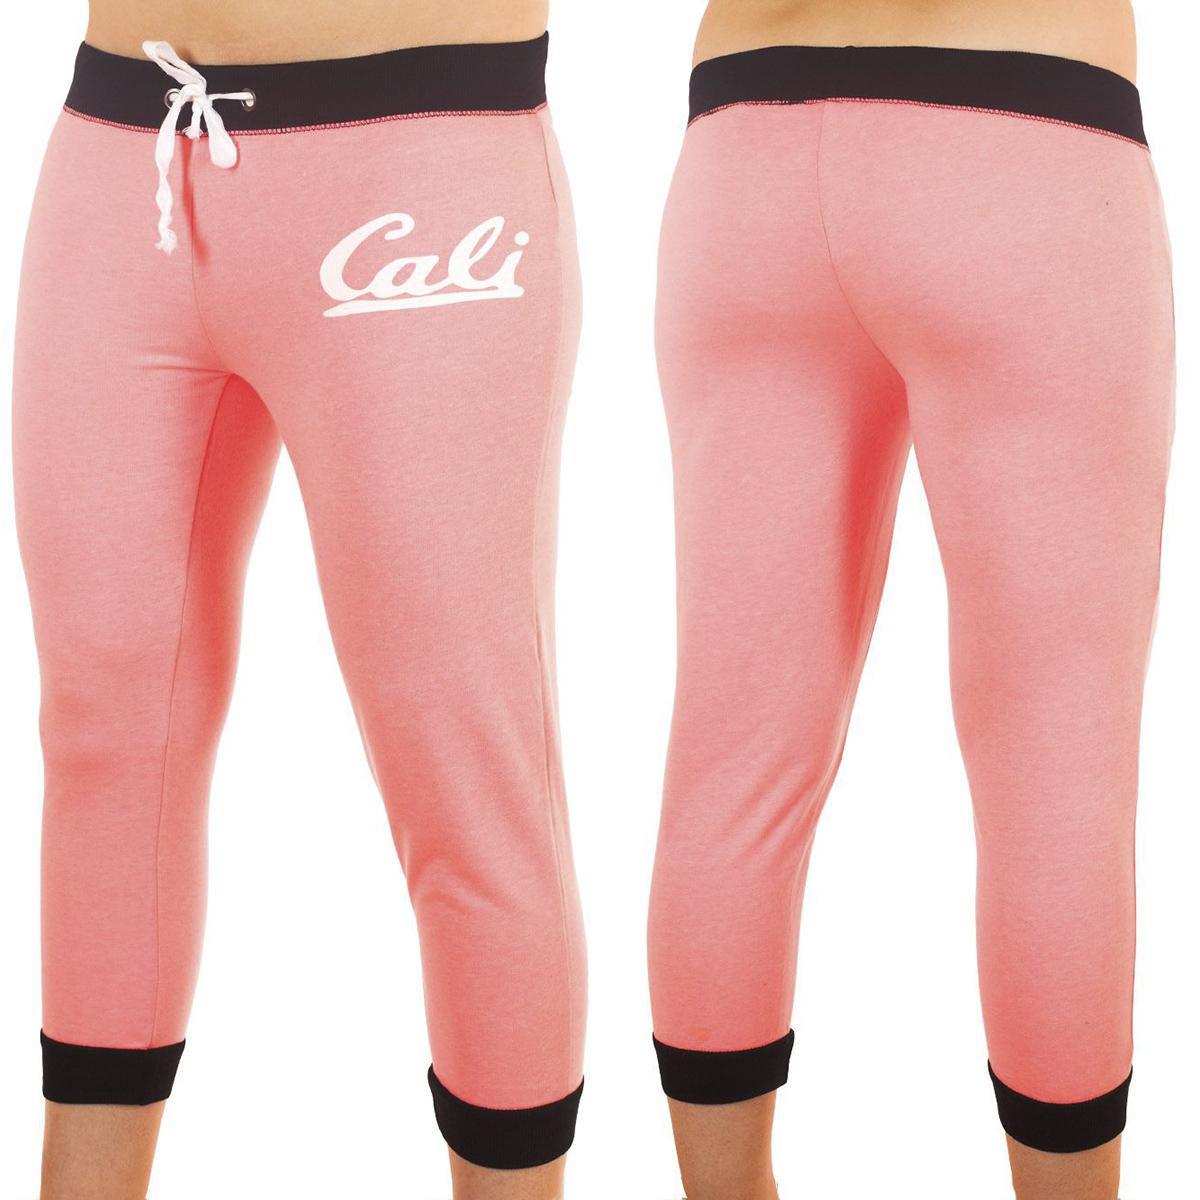 Розовые брючки капри Coco Limon для фитнес-тренинга